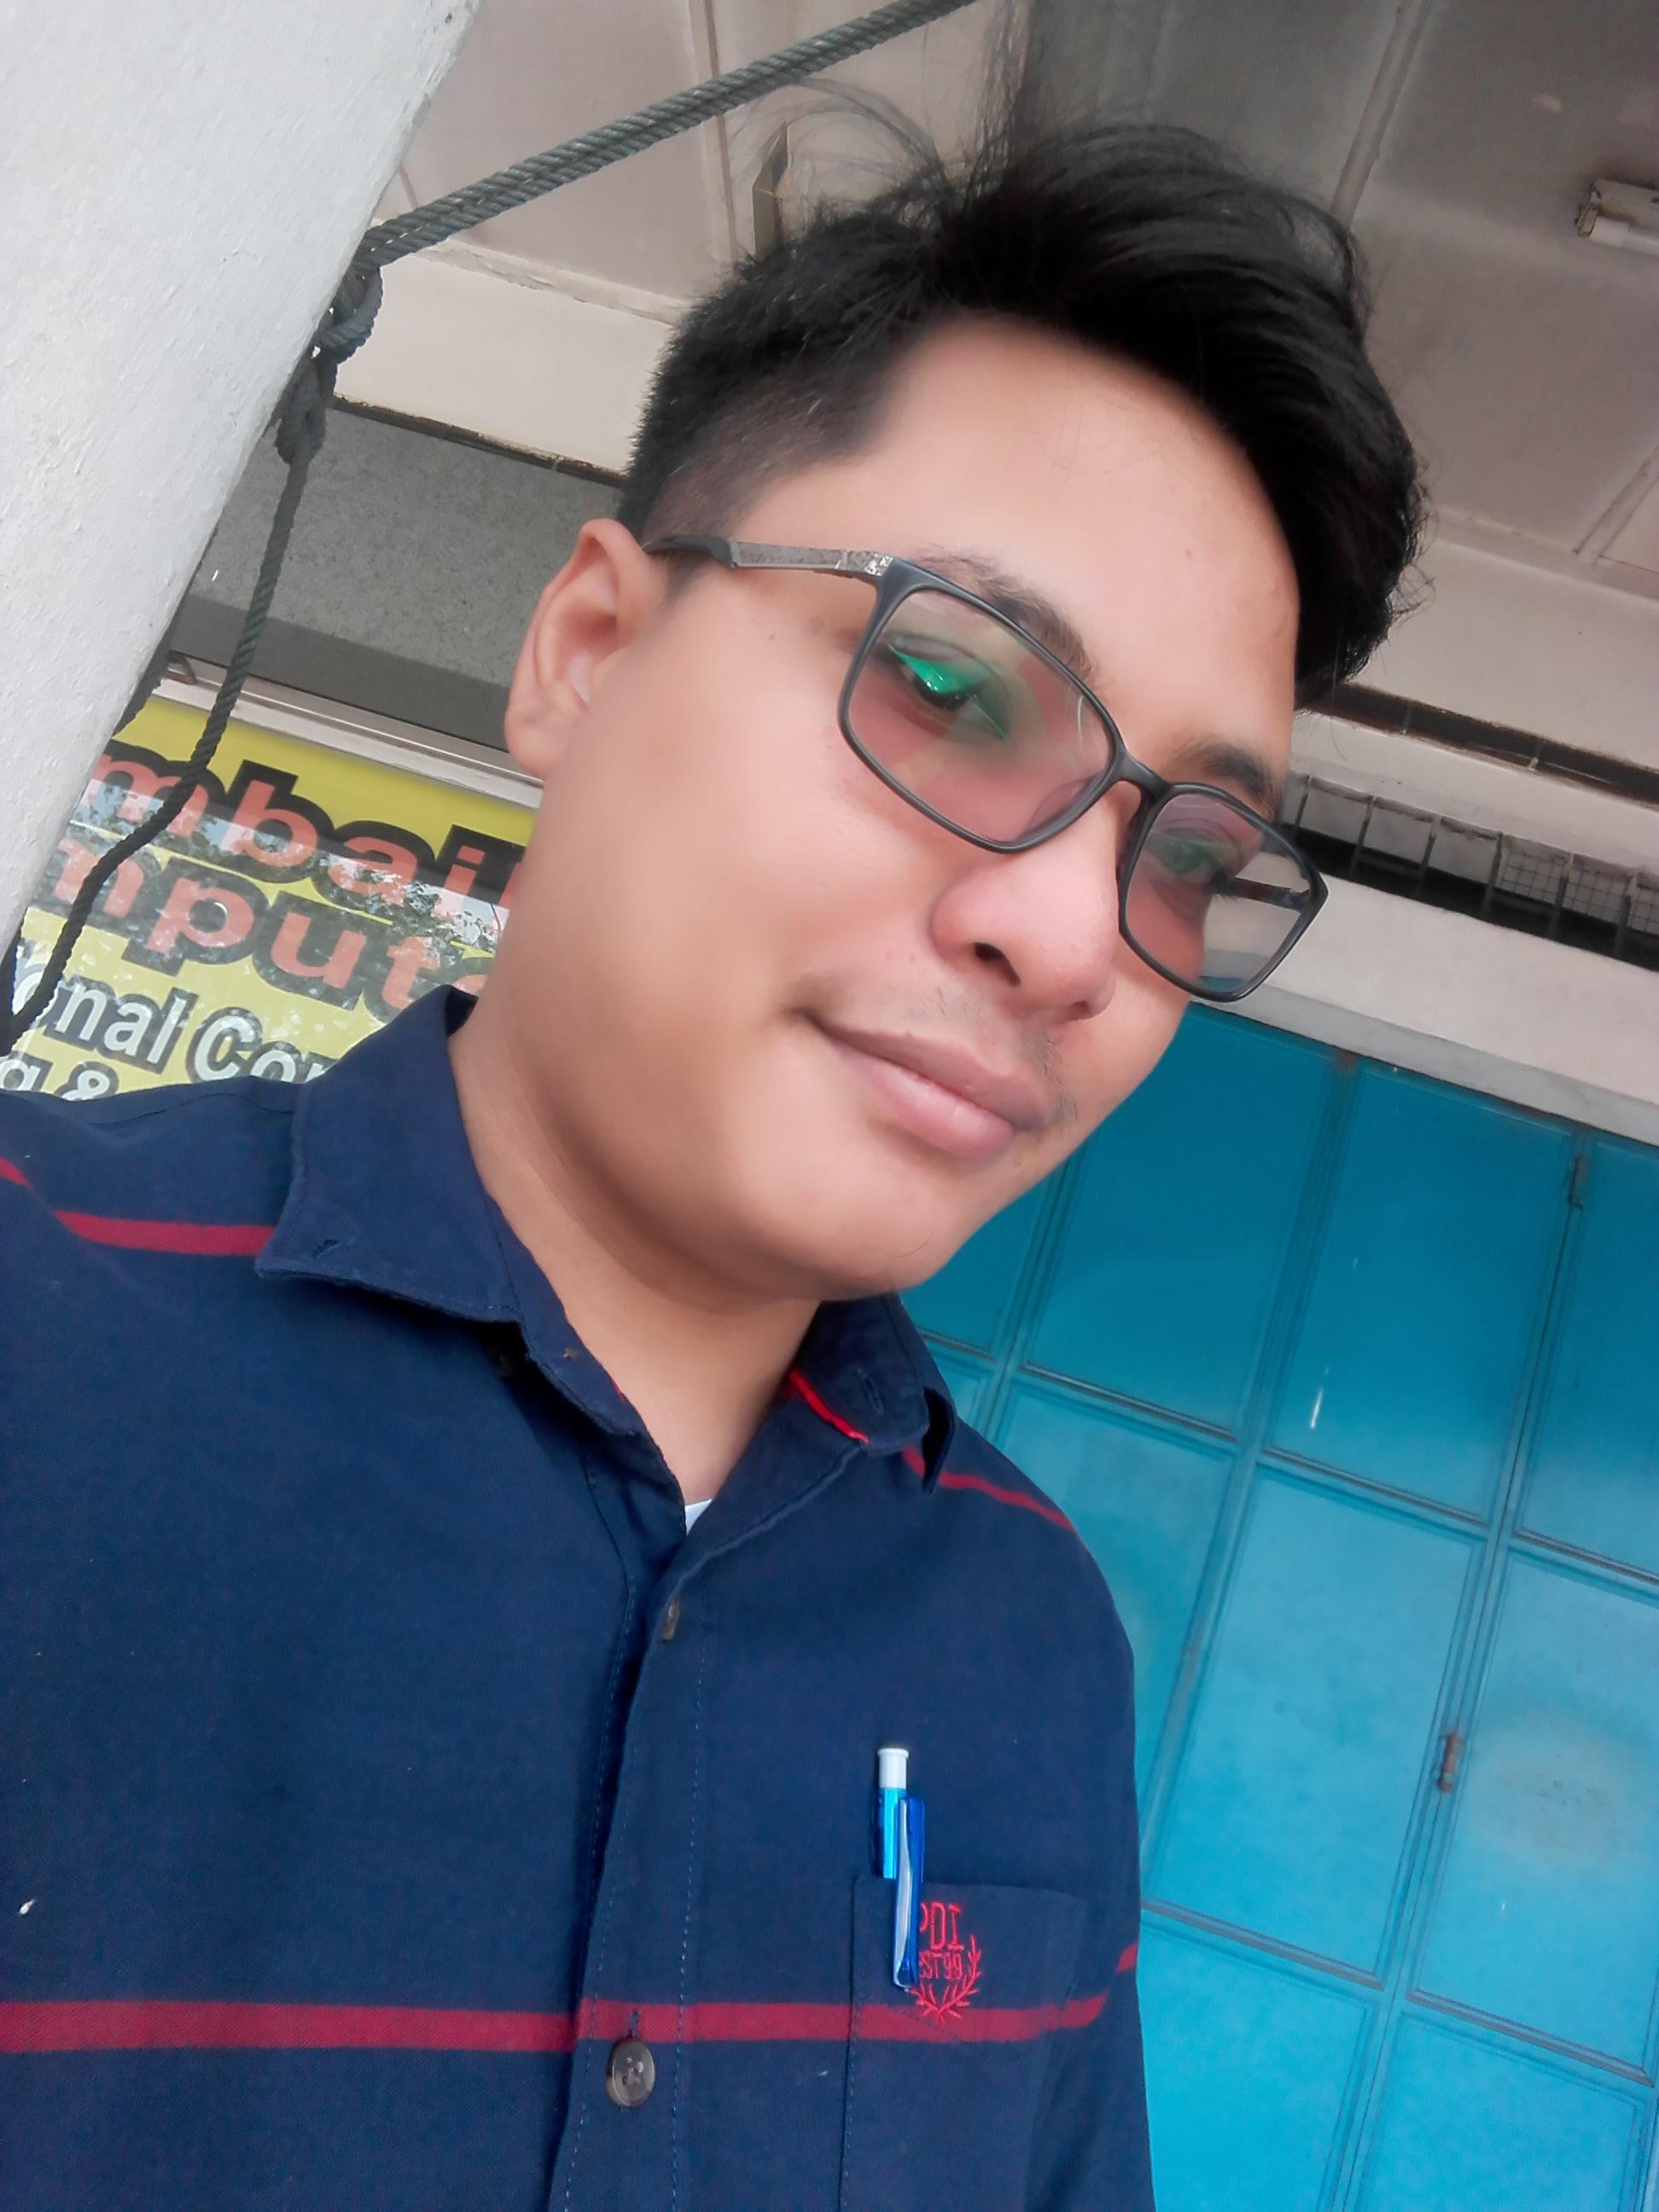 IMG_20180210_124830 - muhammad zuhair abdul jalil.jpg